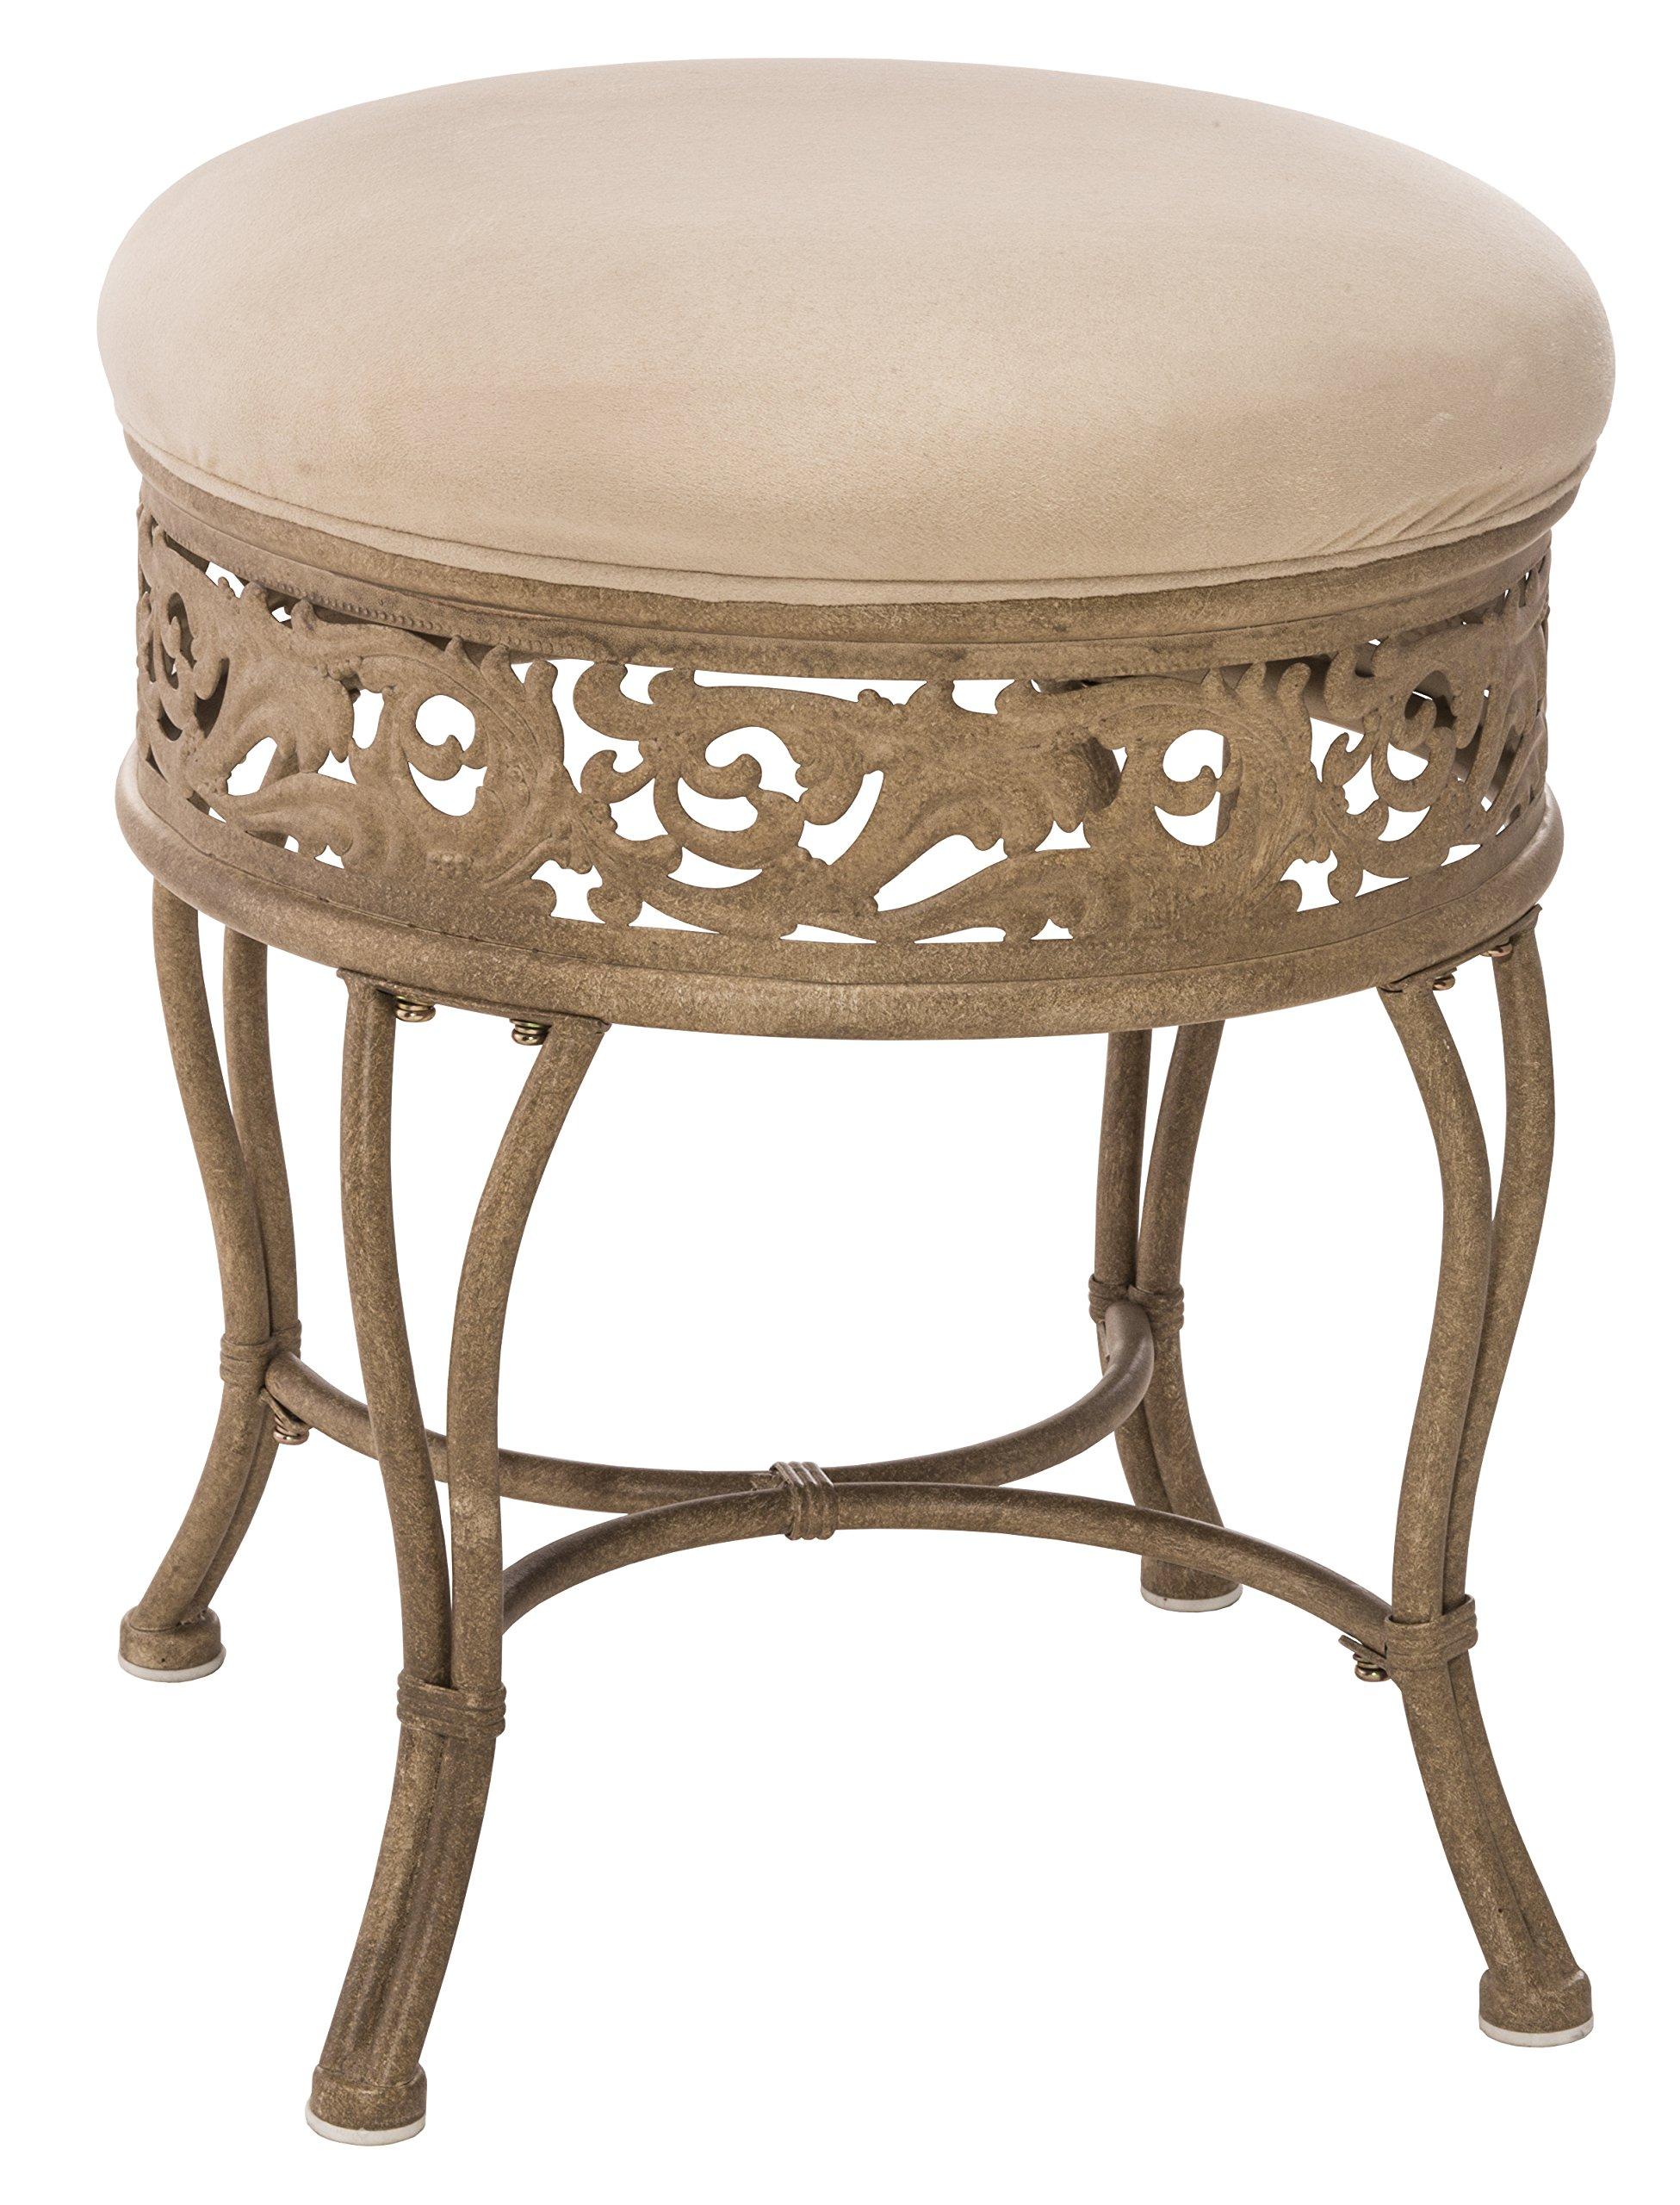 Hillsdale Villa III Vanity Stool, Antique Beige by Hillsdale Furniture